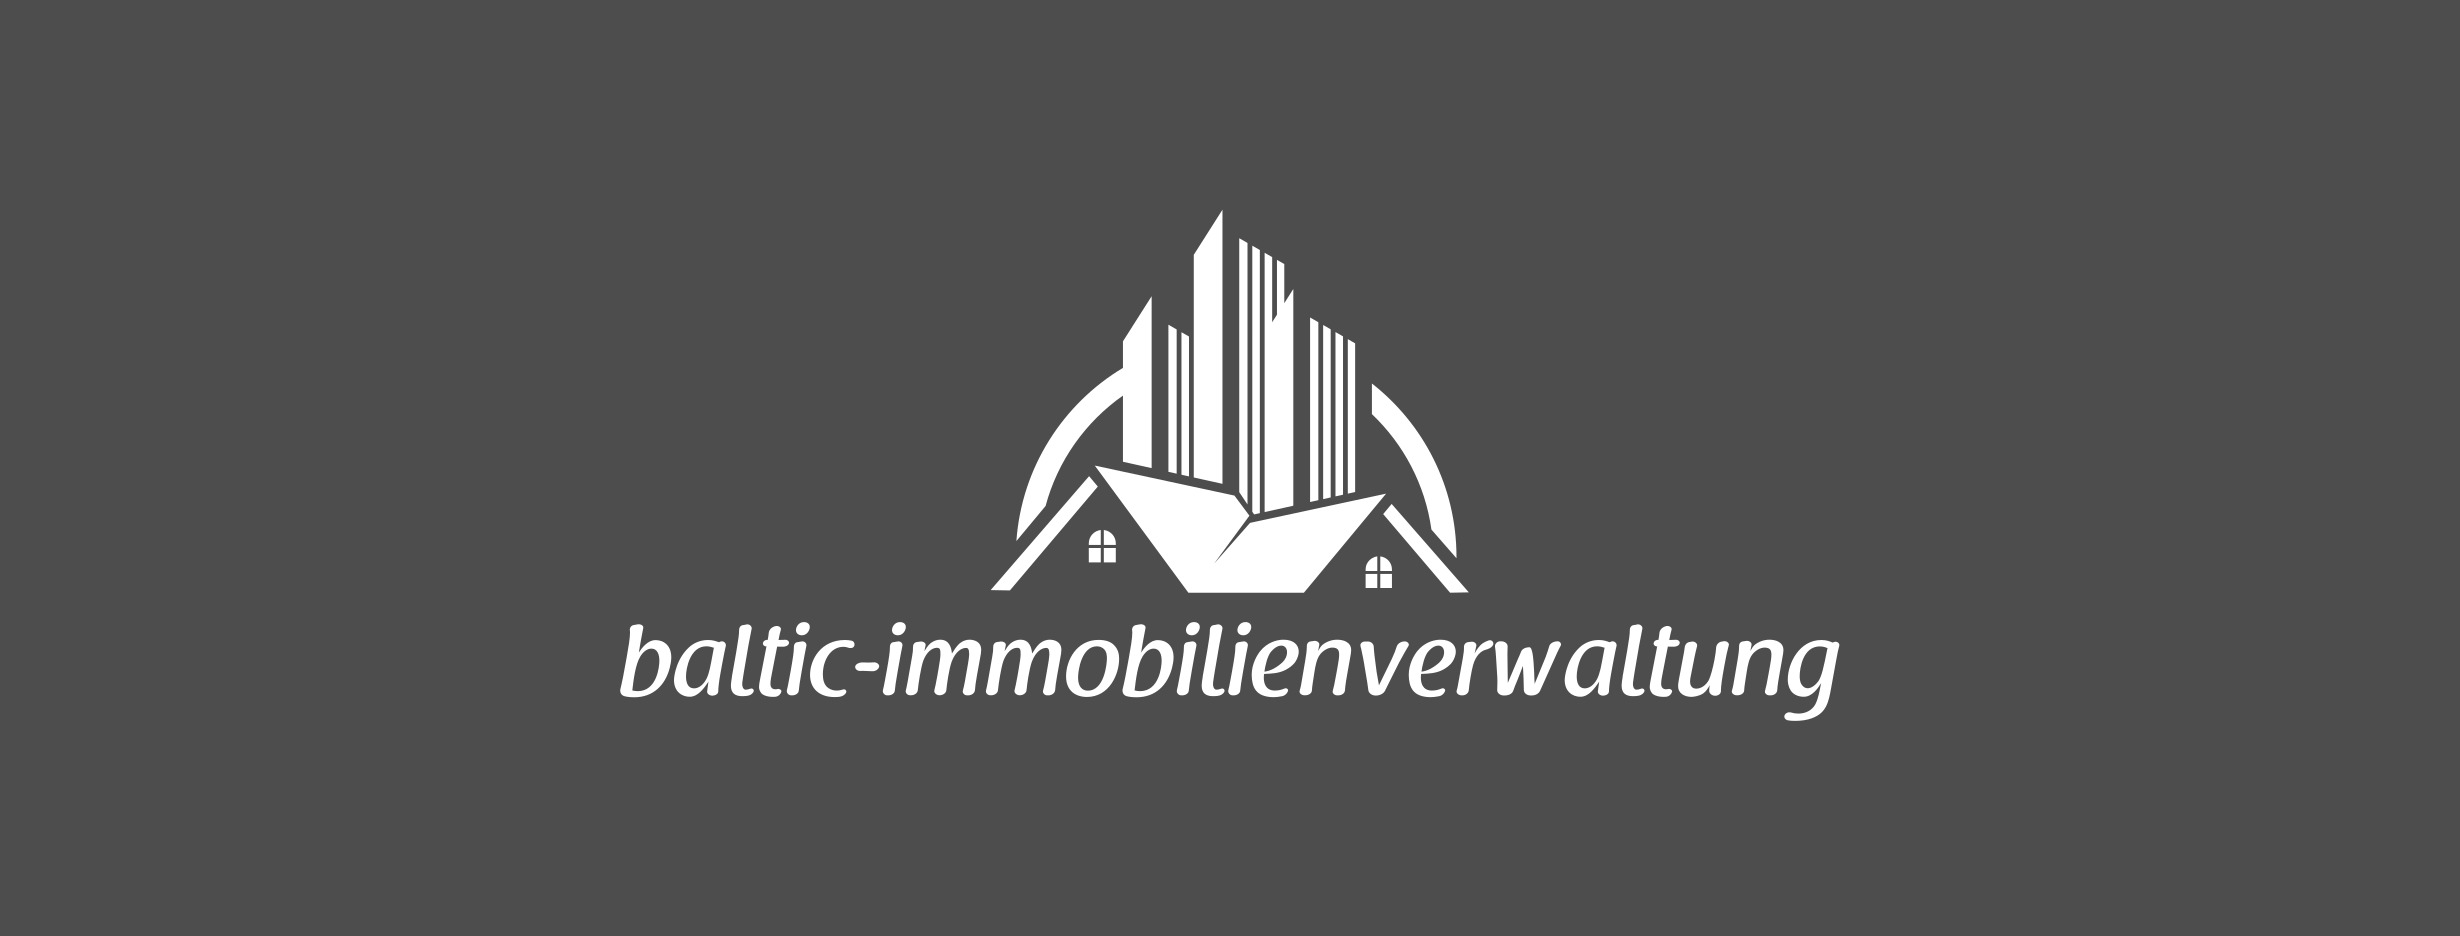 cover-logo-white-grey